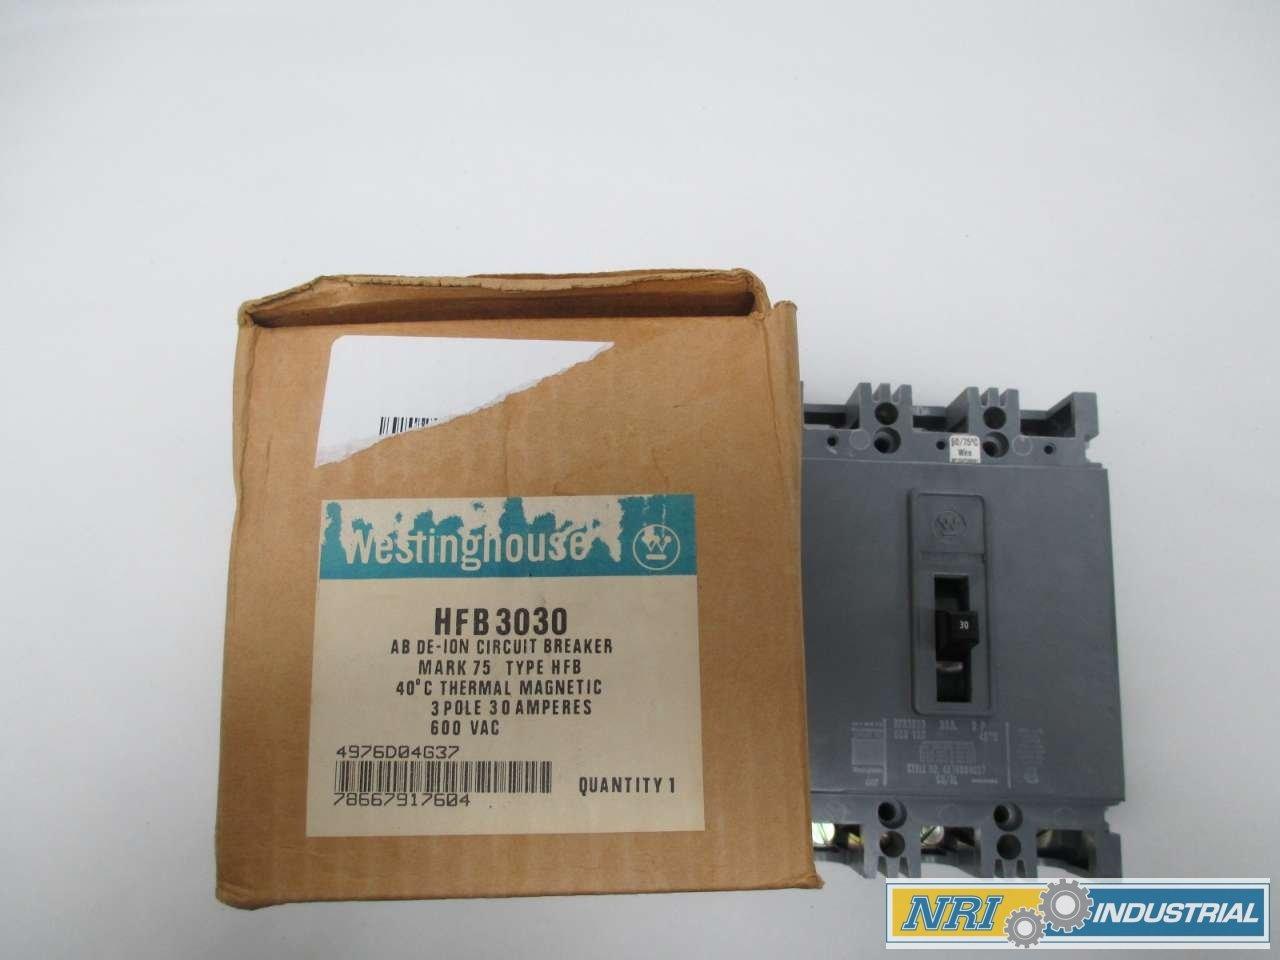 NEW WESTINGHOUSE HFB3030 MOLDED CASE 3P 30A AMP 600V-AC CIRCUIT BREAKER D349001